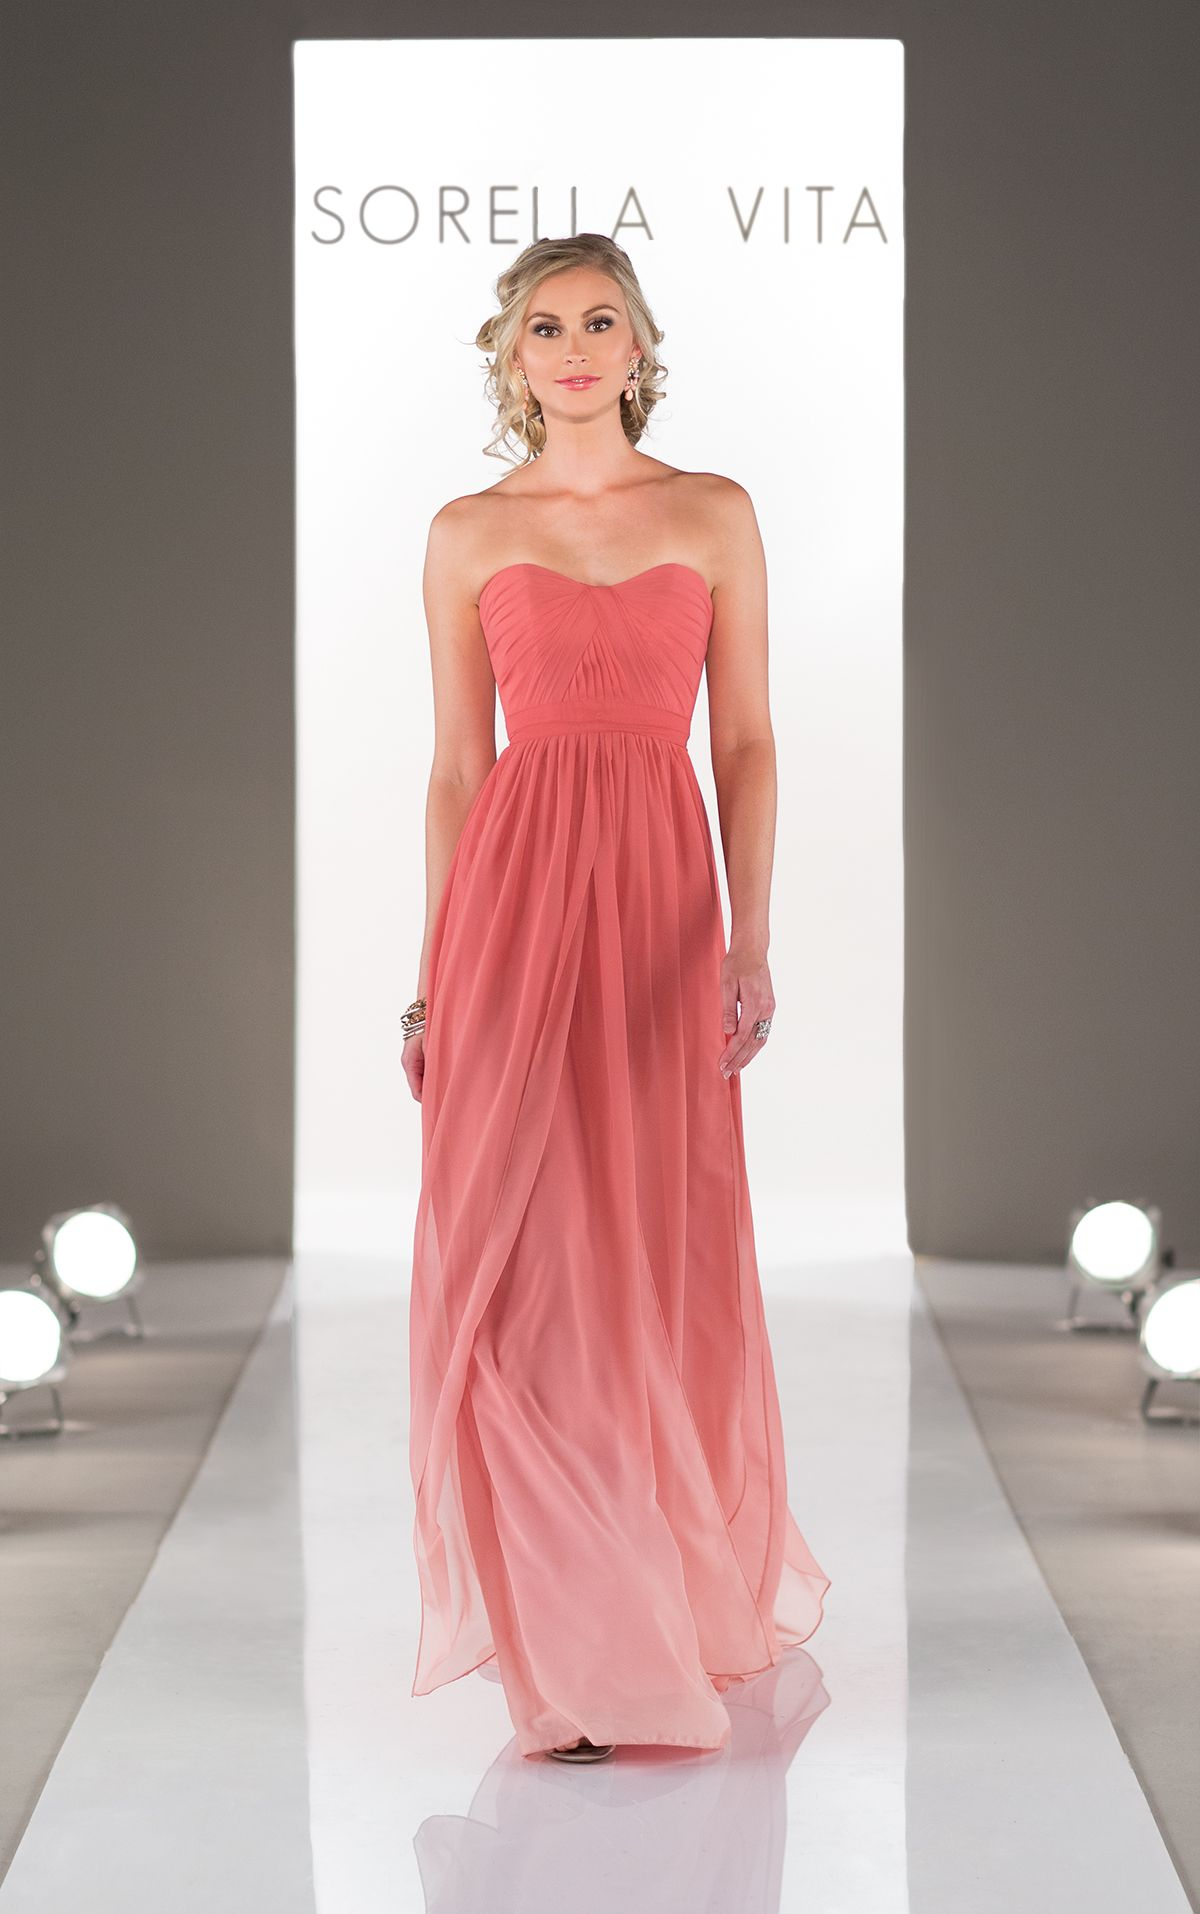 Convertible Bridesmaid Dress by Sorella Vita | Damitas de honor ...